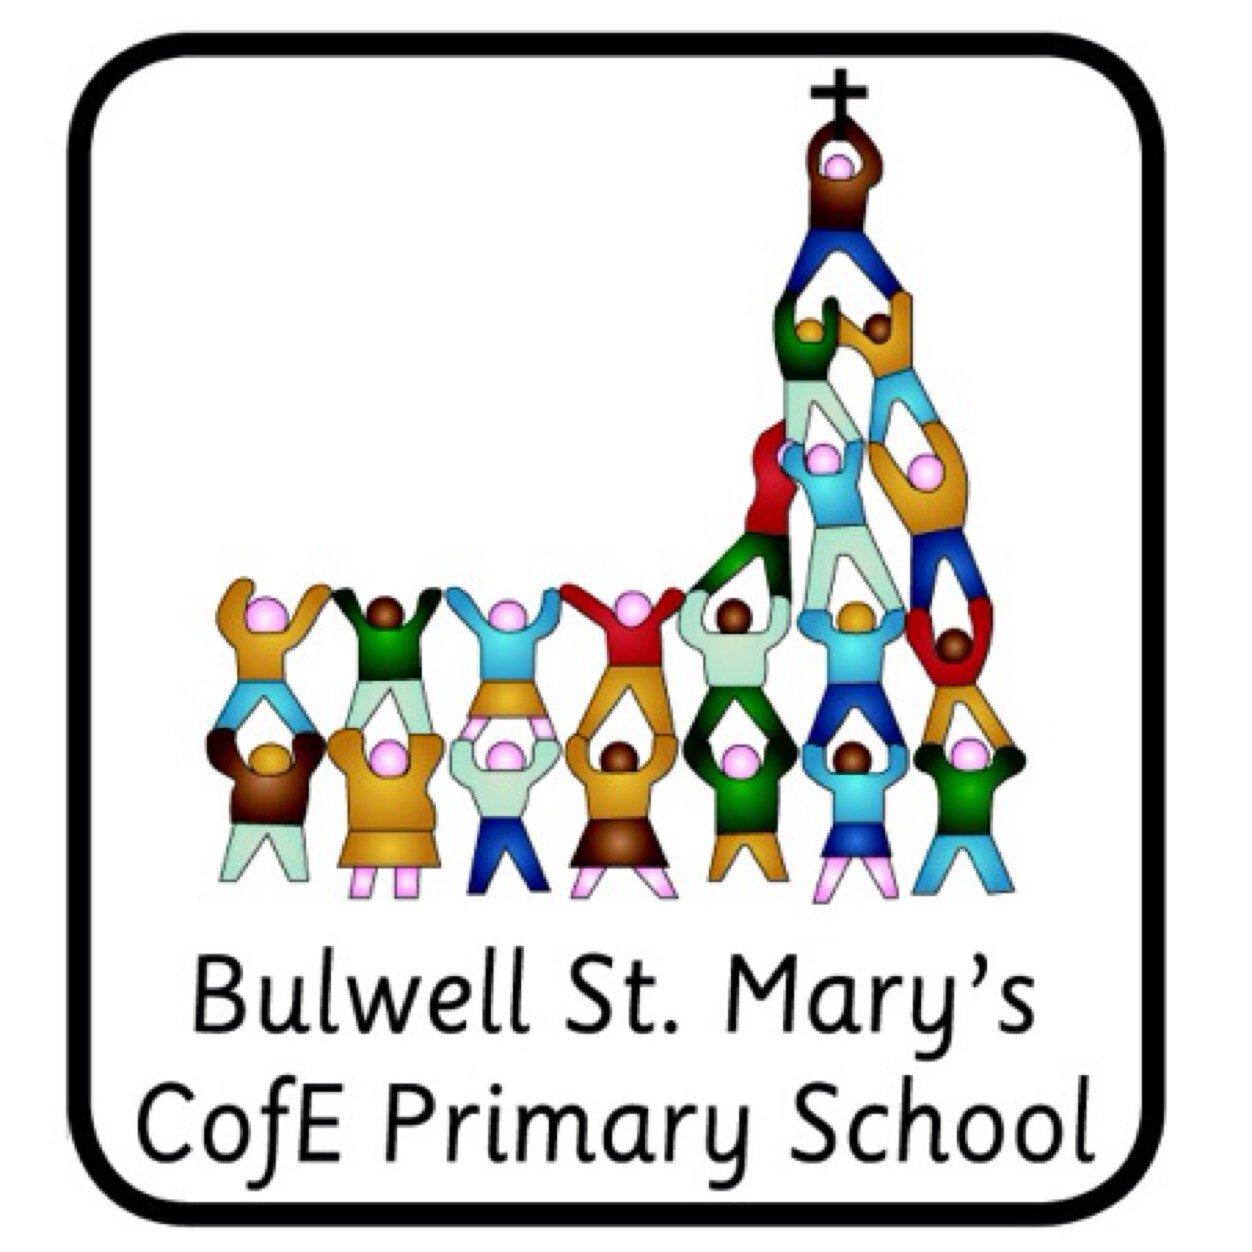 Bulwell St Marys BulwellStMarys